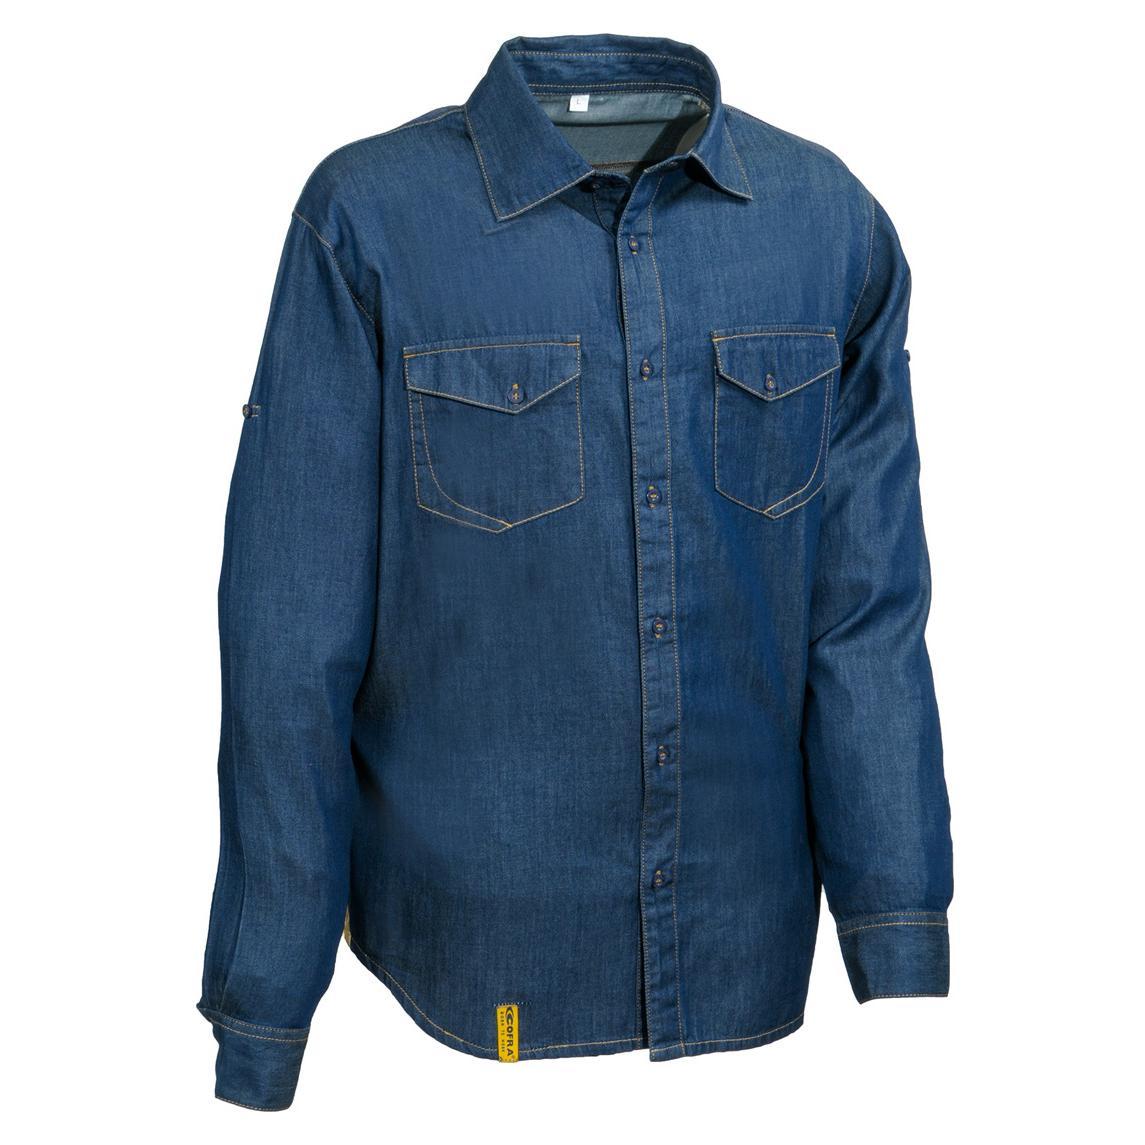 new product 3f5d0 cbbdc Camicie da lavoro - Best Safety